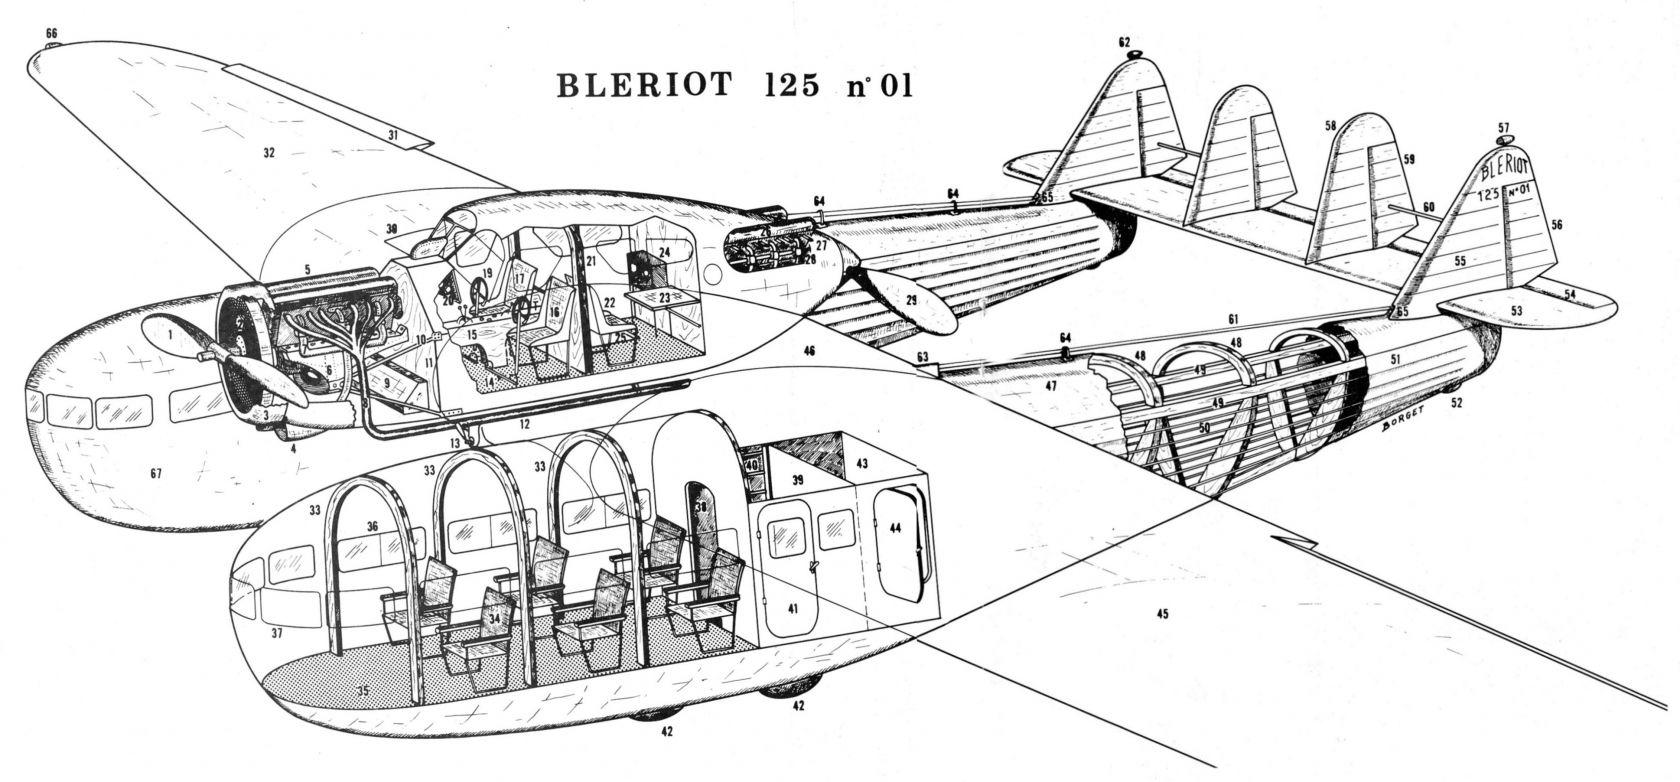 Bleriot B-125